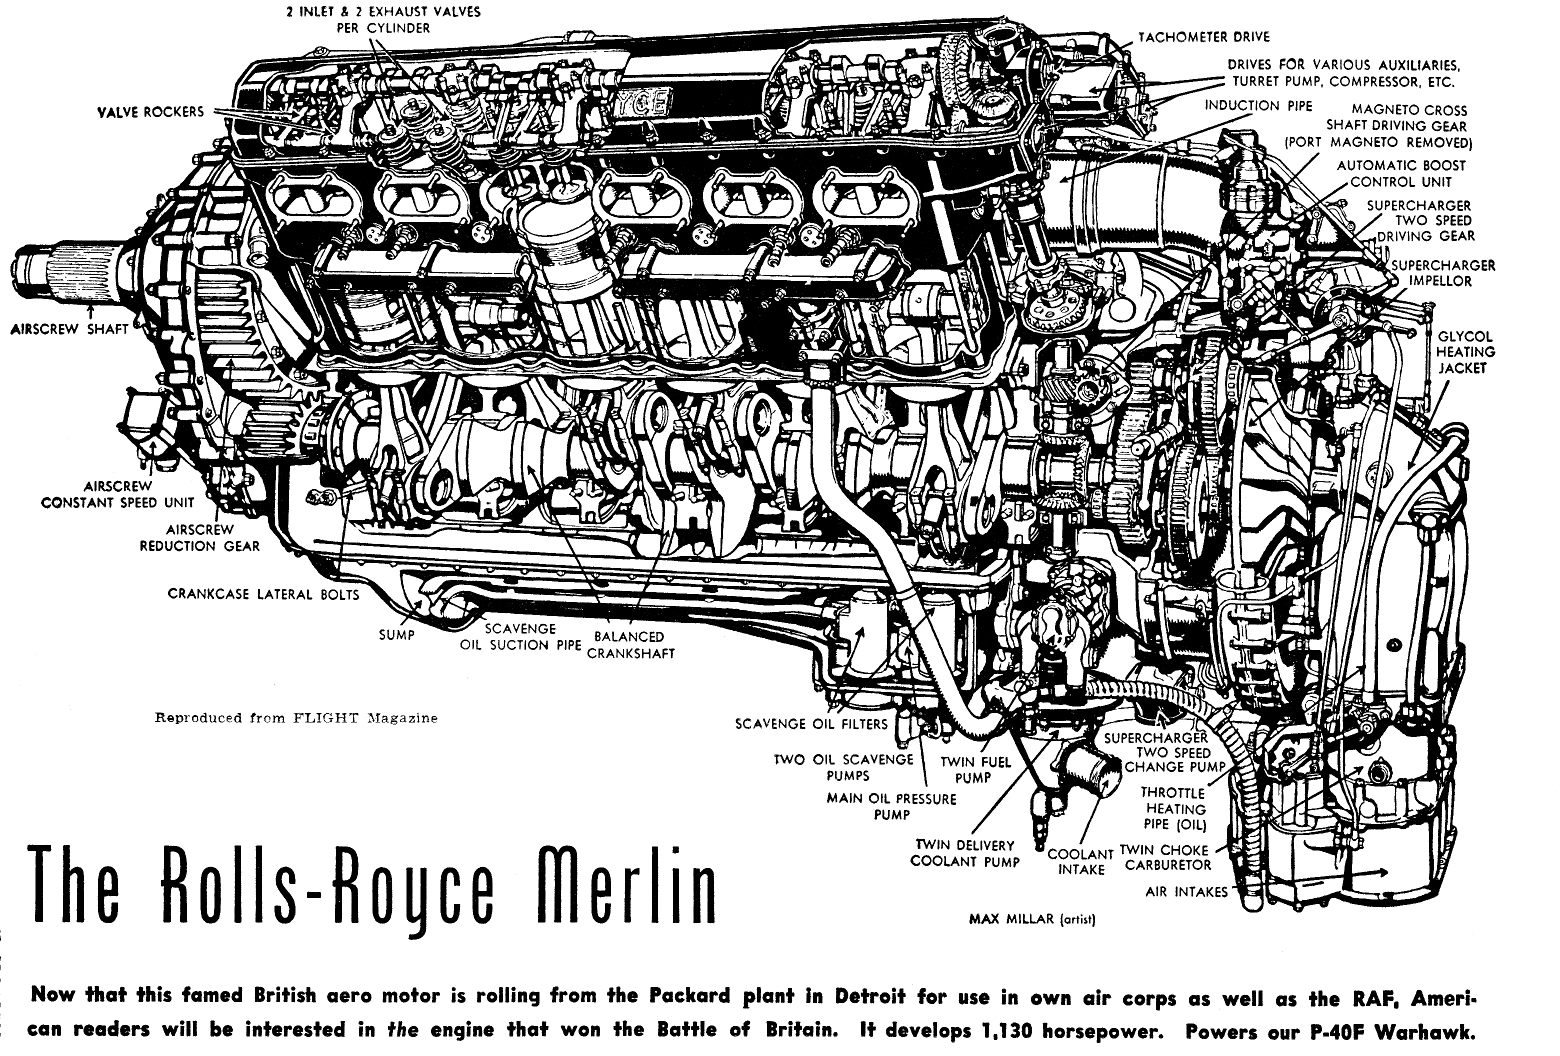 merlin engine diagram engine diagram for 3 1 engine merlin engine | flight | pinterest | engine, aircraft and ...